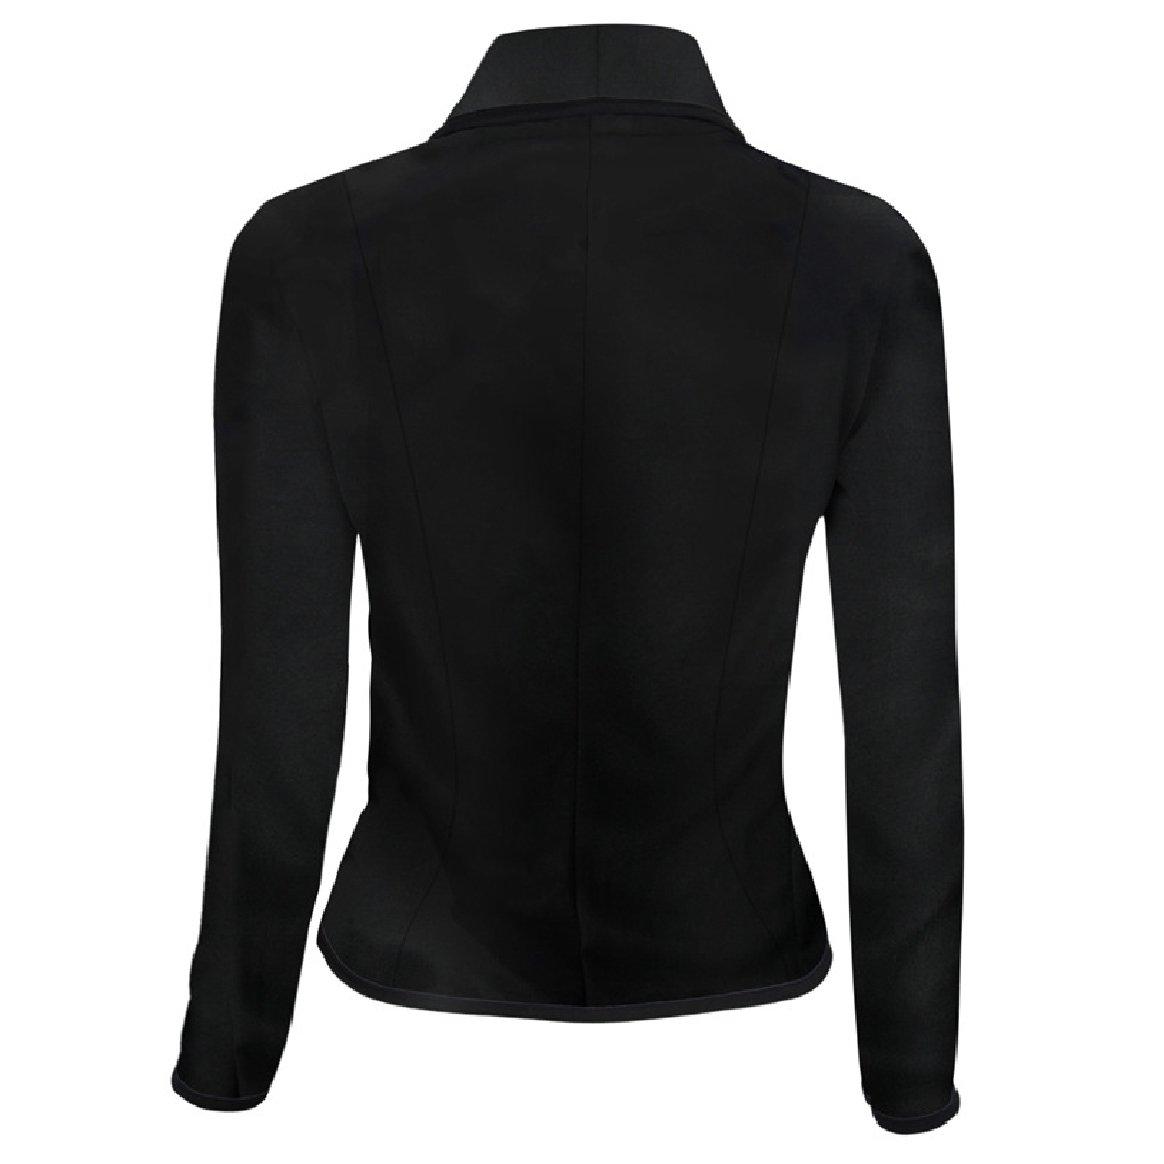 YUNY Womens 2 Button Stylish Plus-Size Slim Short Blazer Suit Coat Tops Black XL